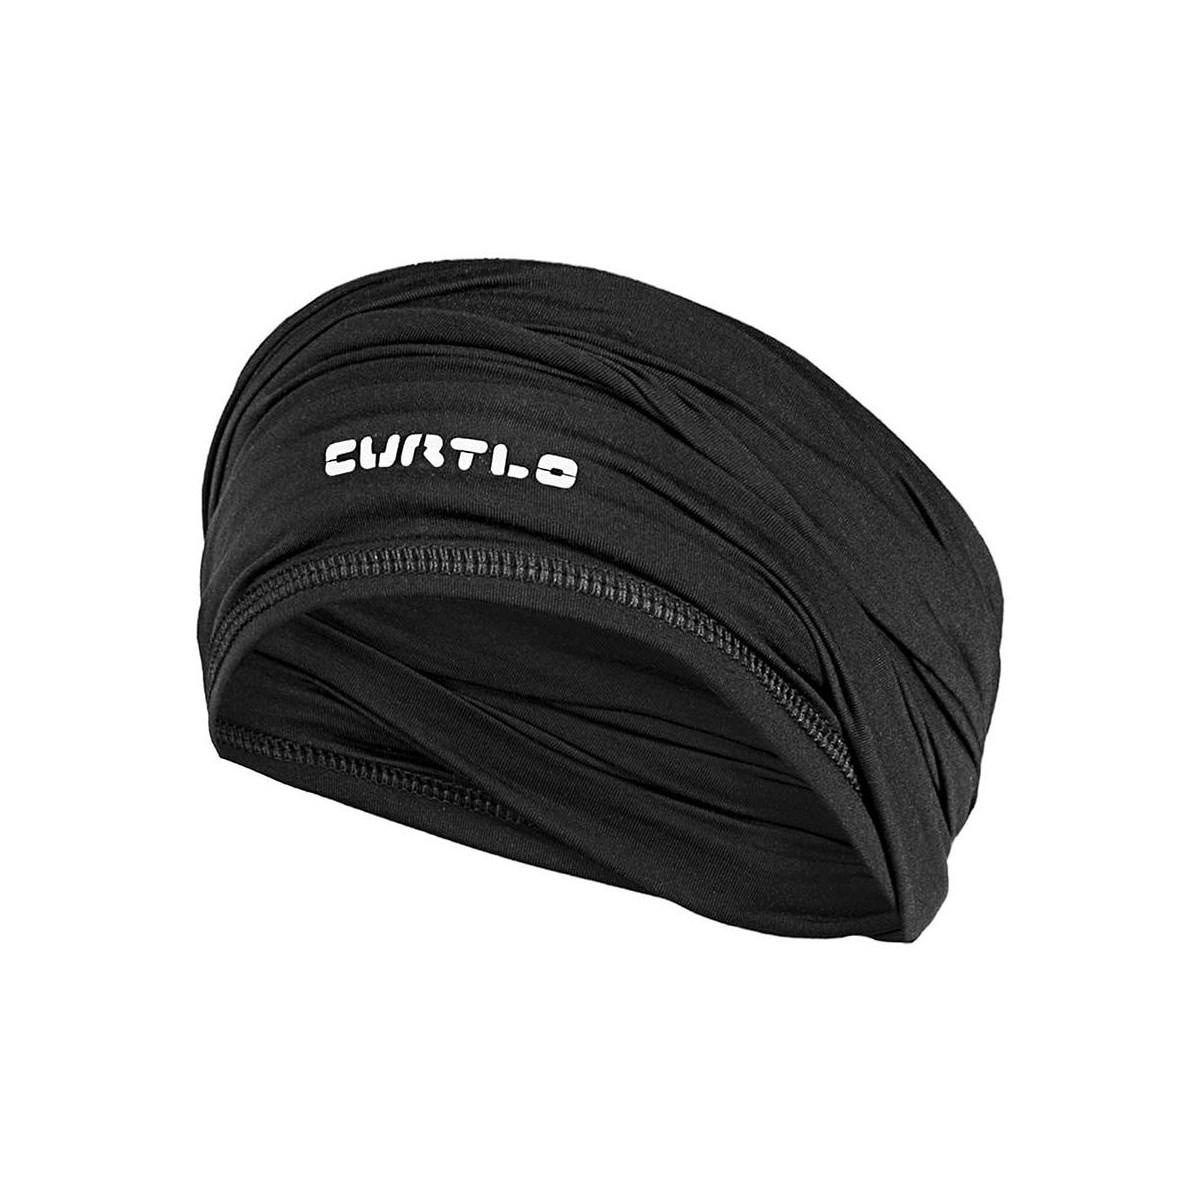 Multiband Curtlo Thermosense